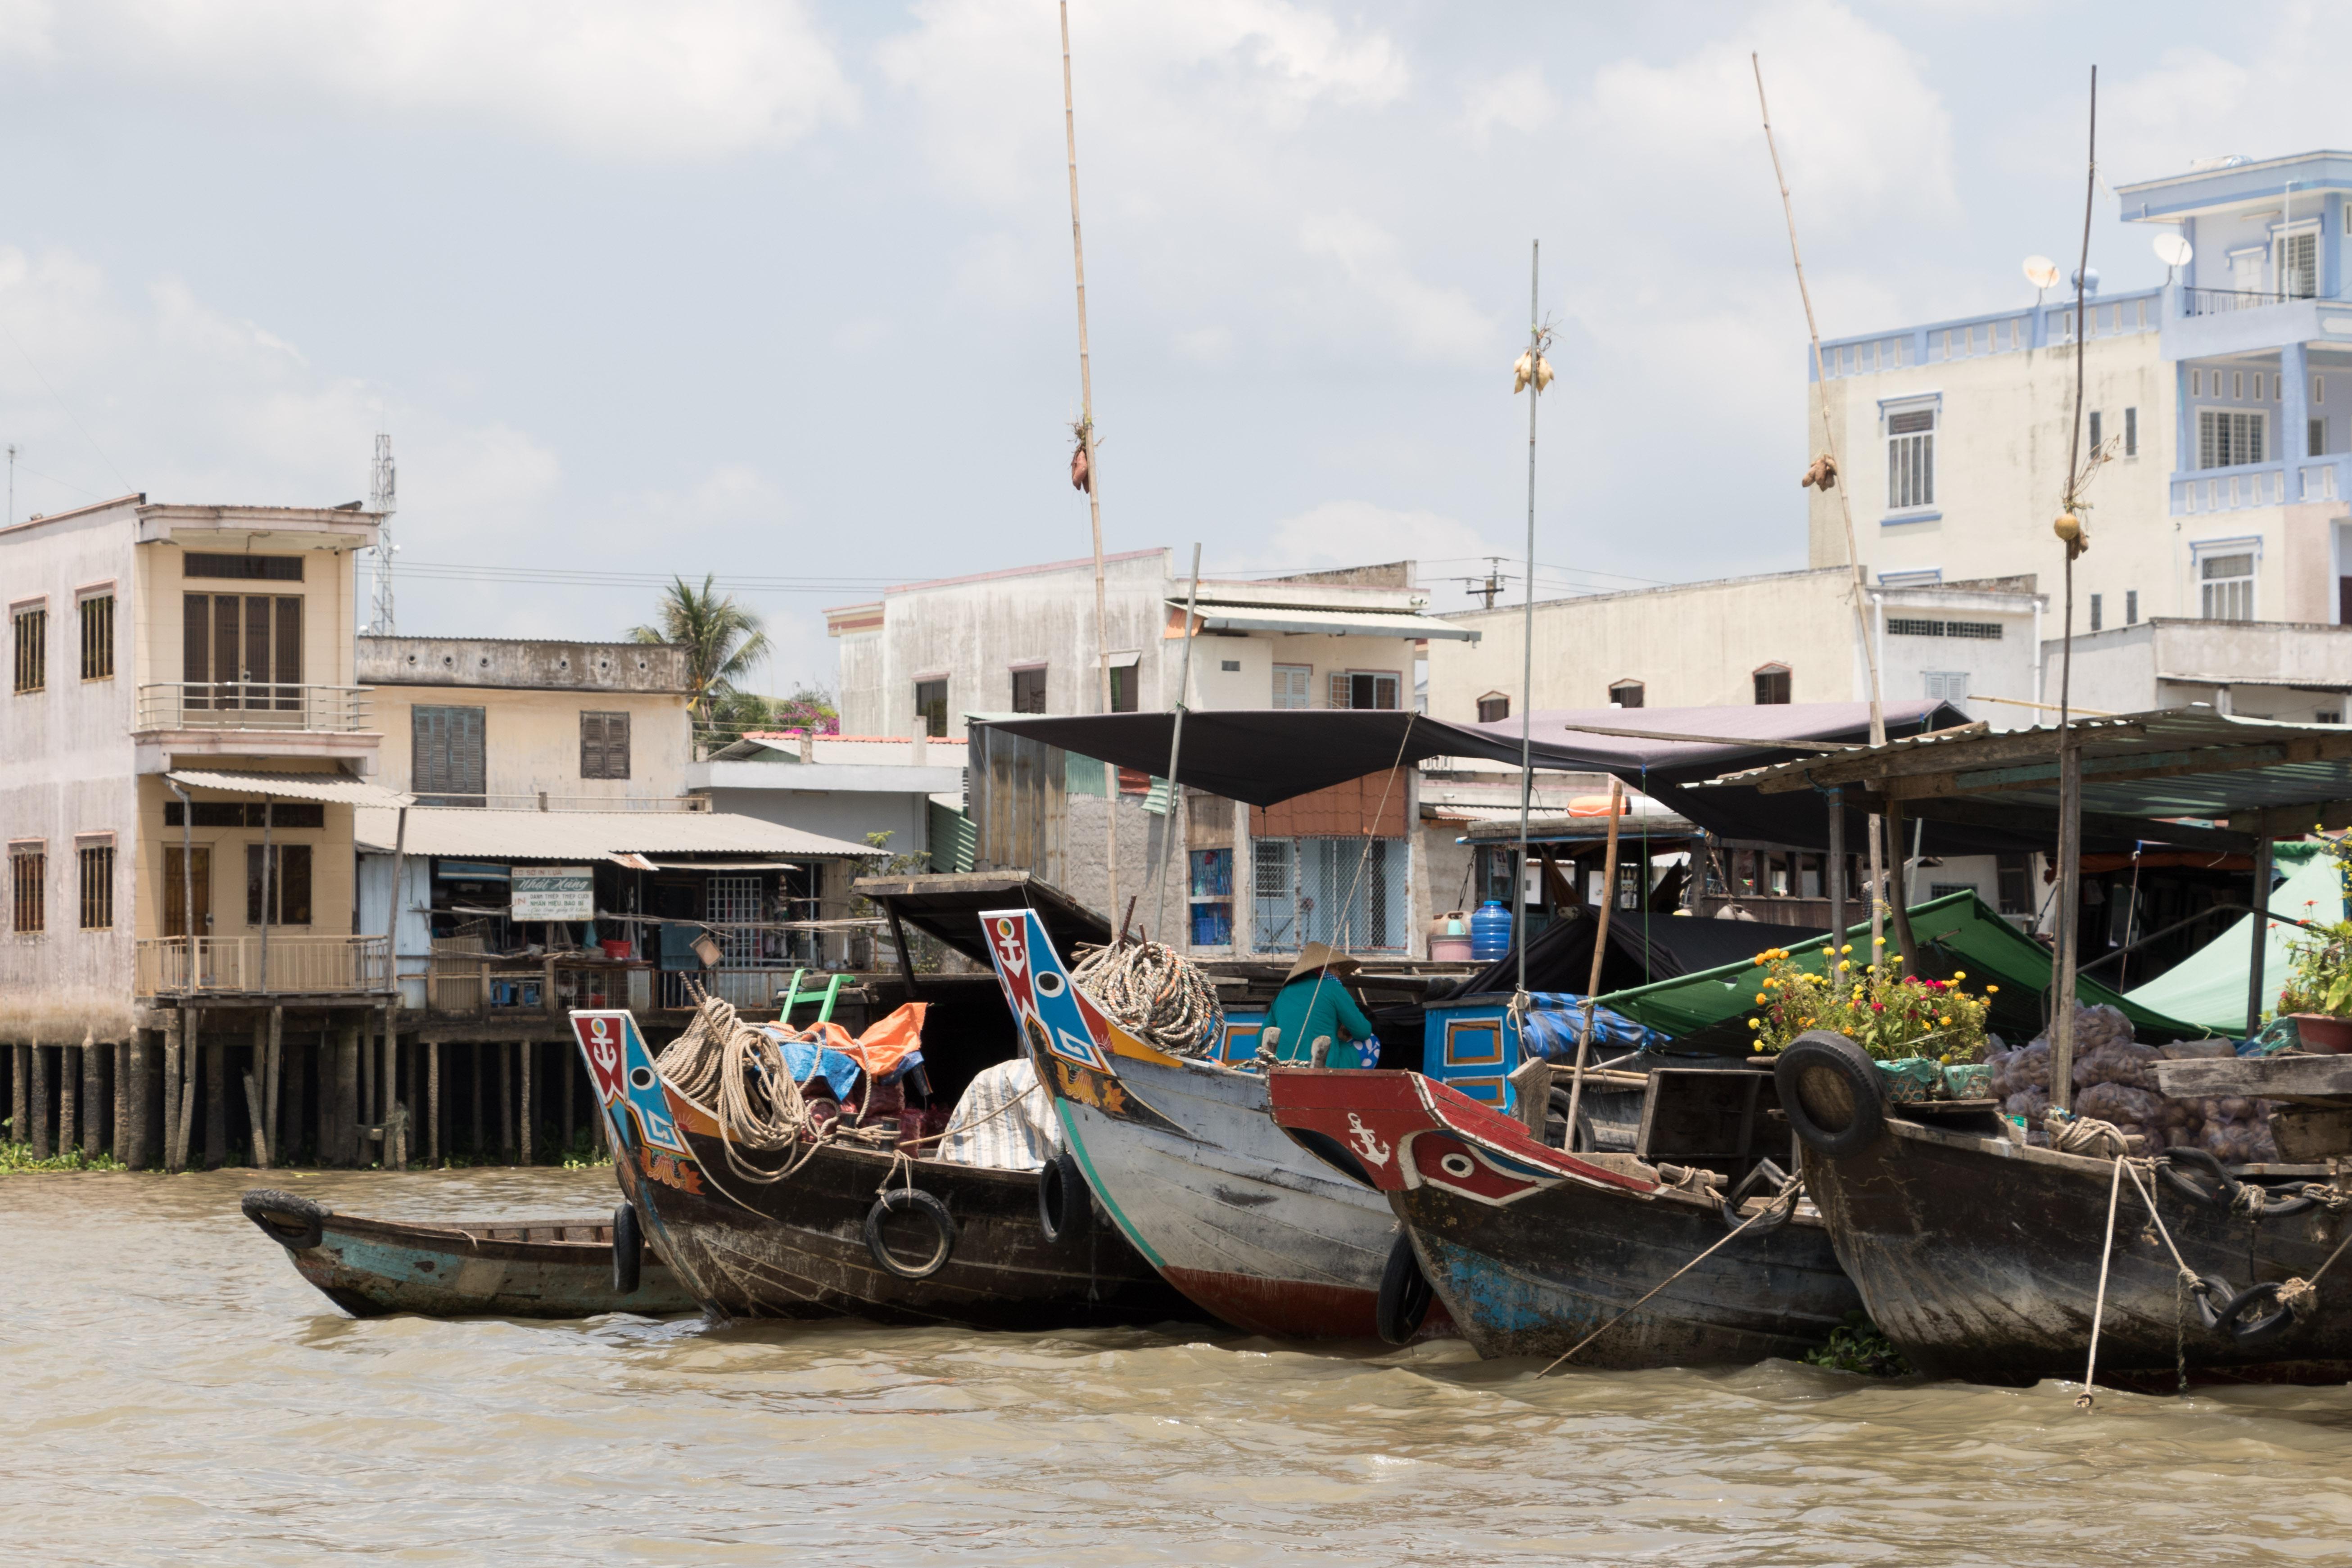 Yvonderweg - Hallo Ho Chi Minh! - De drijvende markt van Cai Be